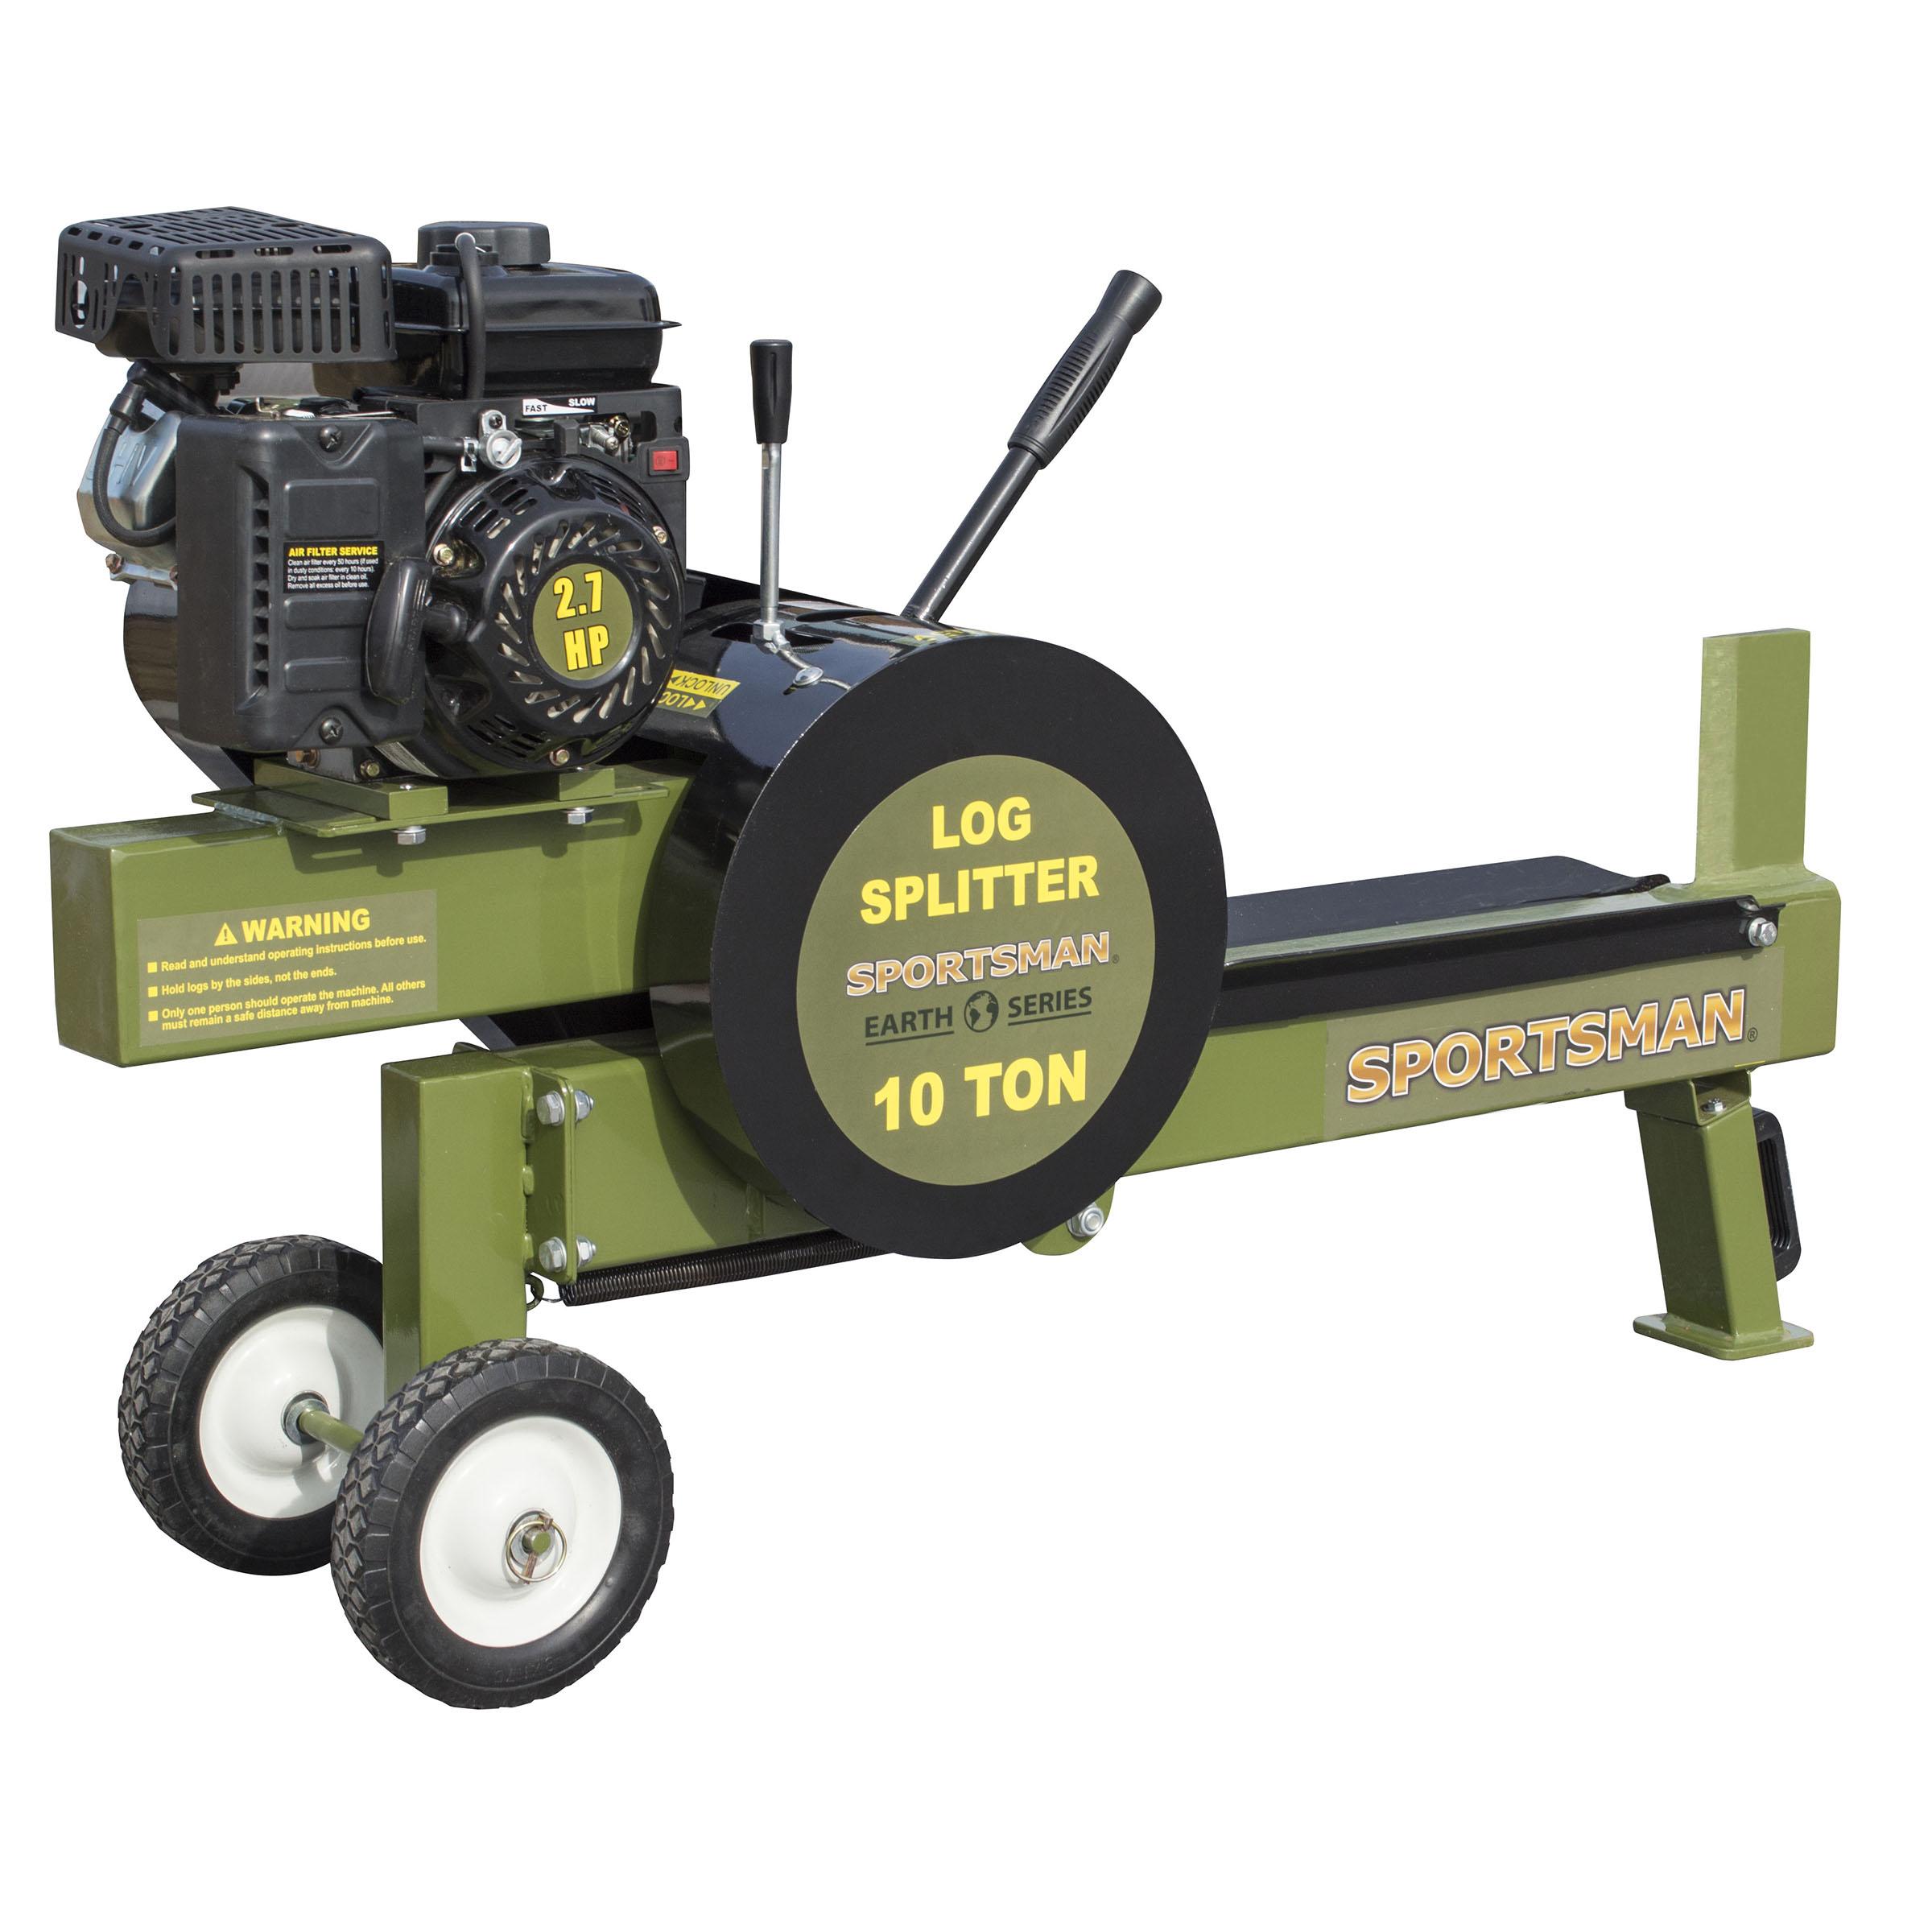 Sportsman Earth Series 10 Ton Gas Powered Kinetic Log Spitter